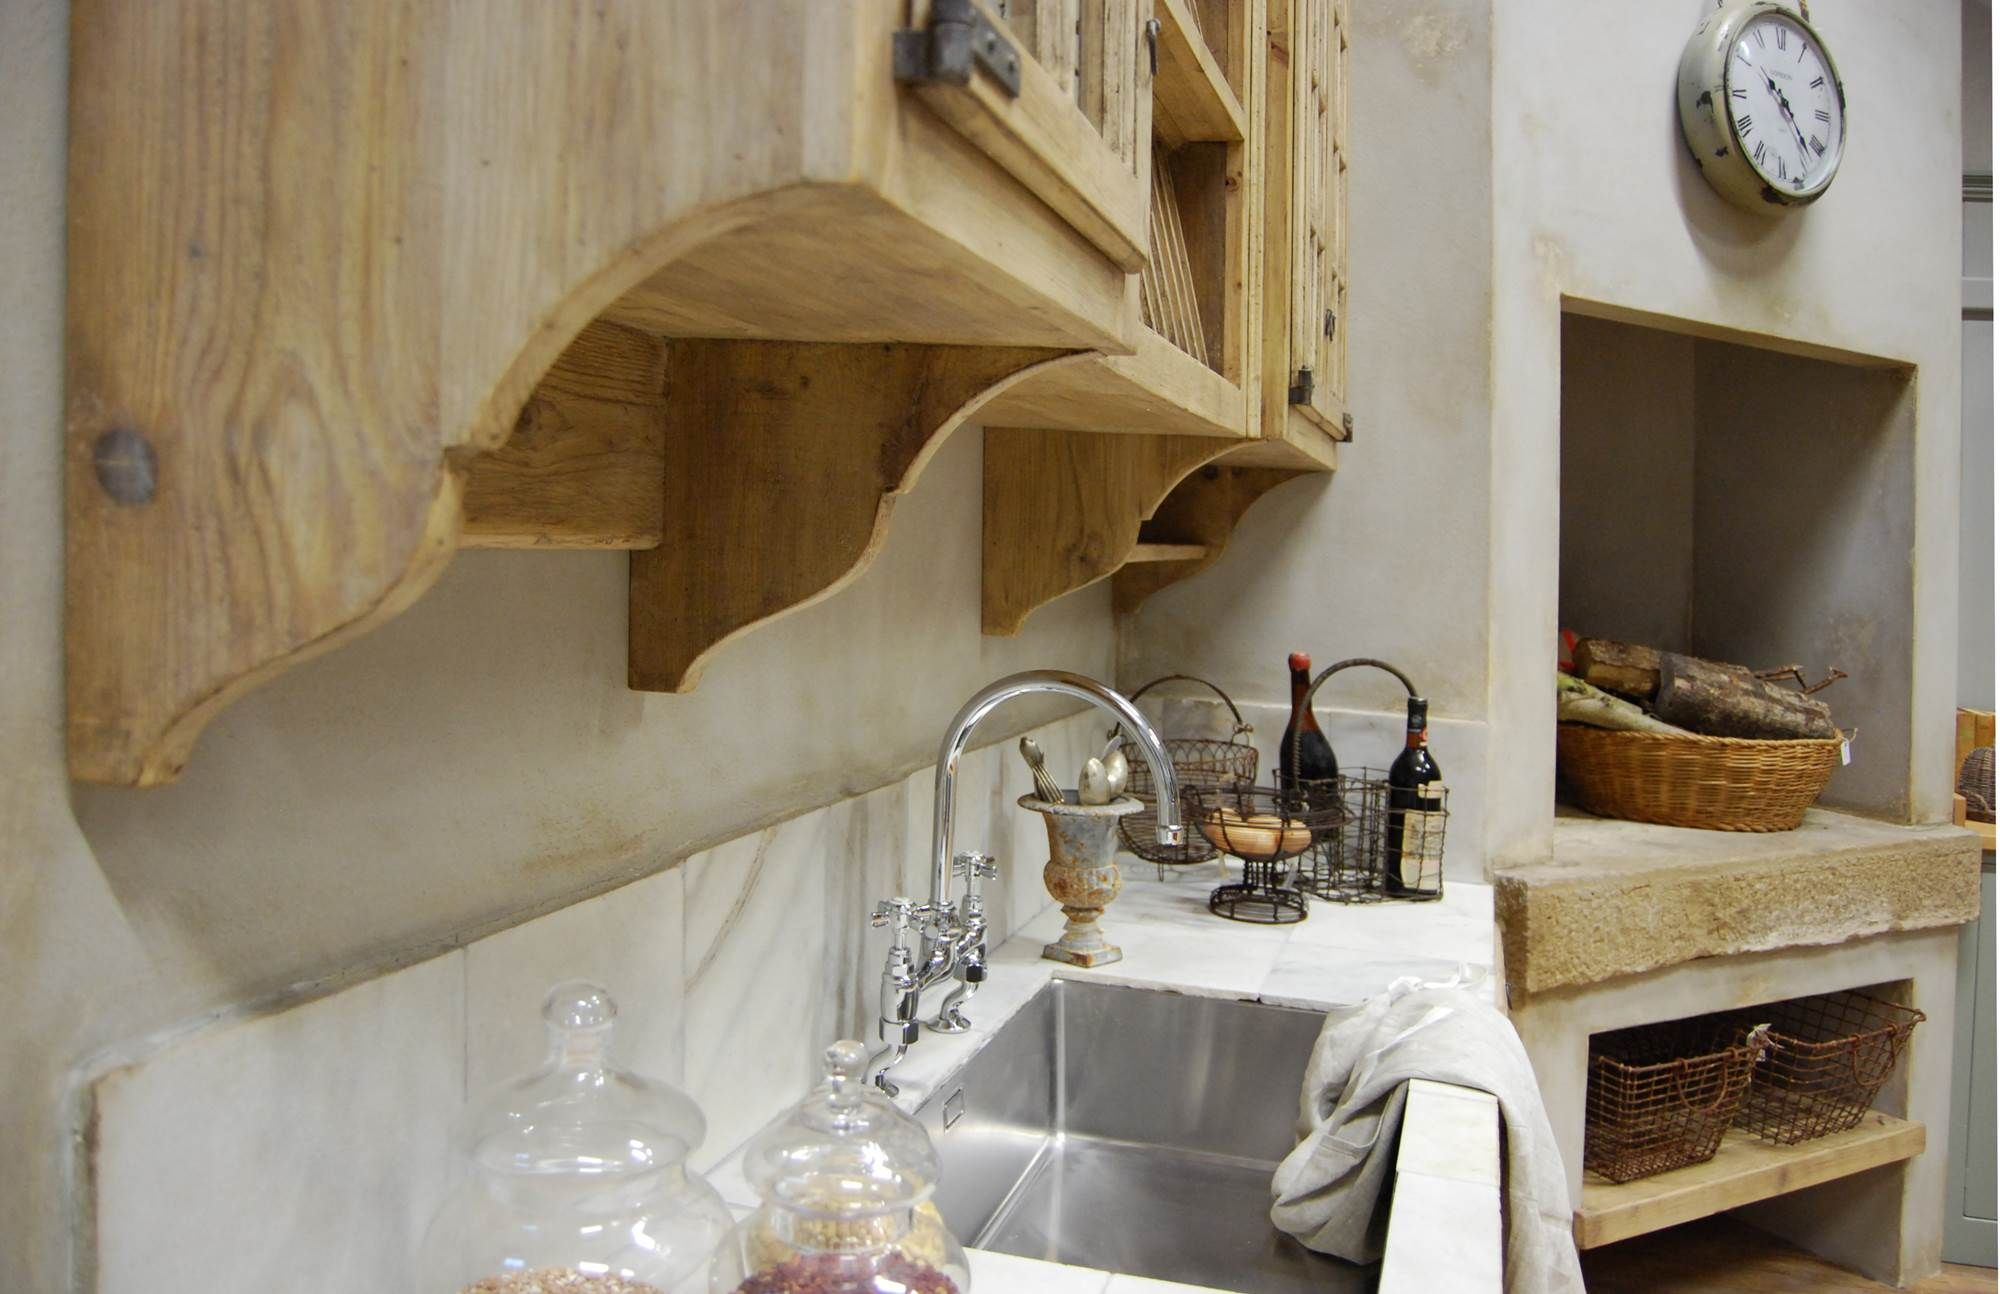 Cucina Shaker Stile Inglese Melodia - Cucine Belli | C Kitchen ...